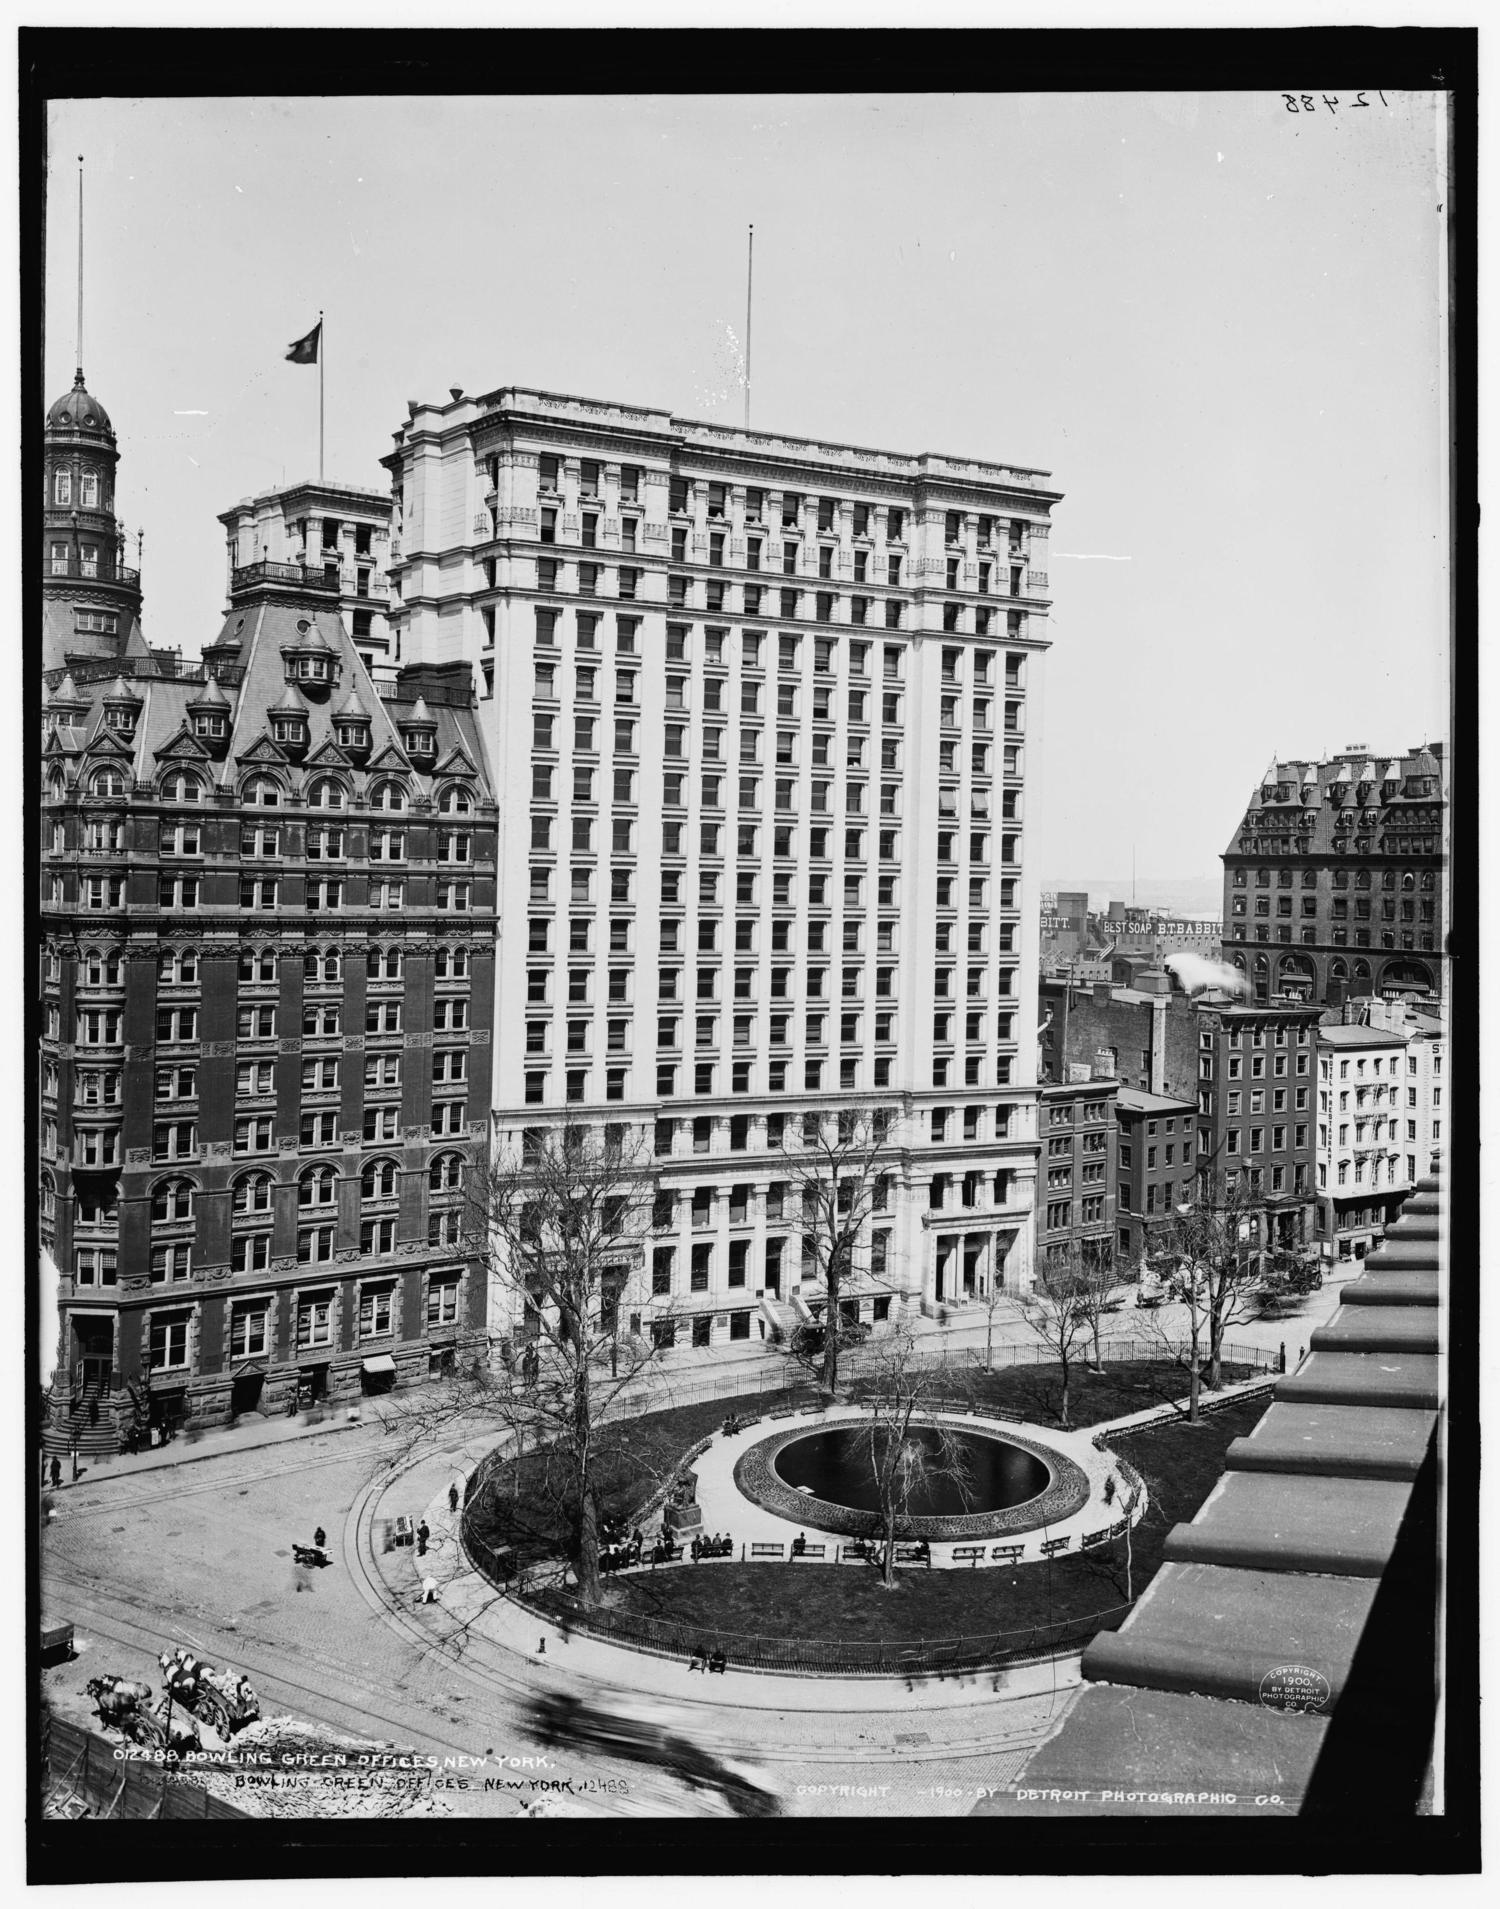 Bowling Green, New York, New York, ca. 1900